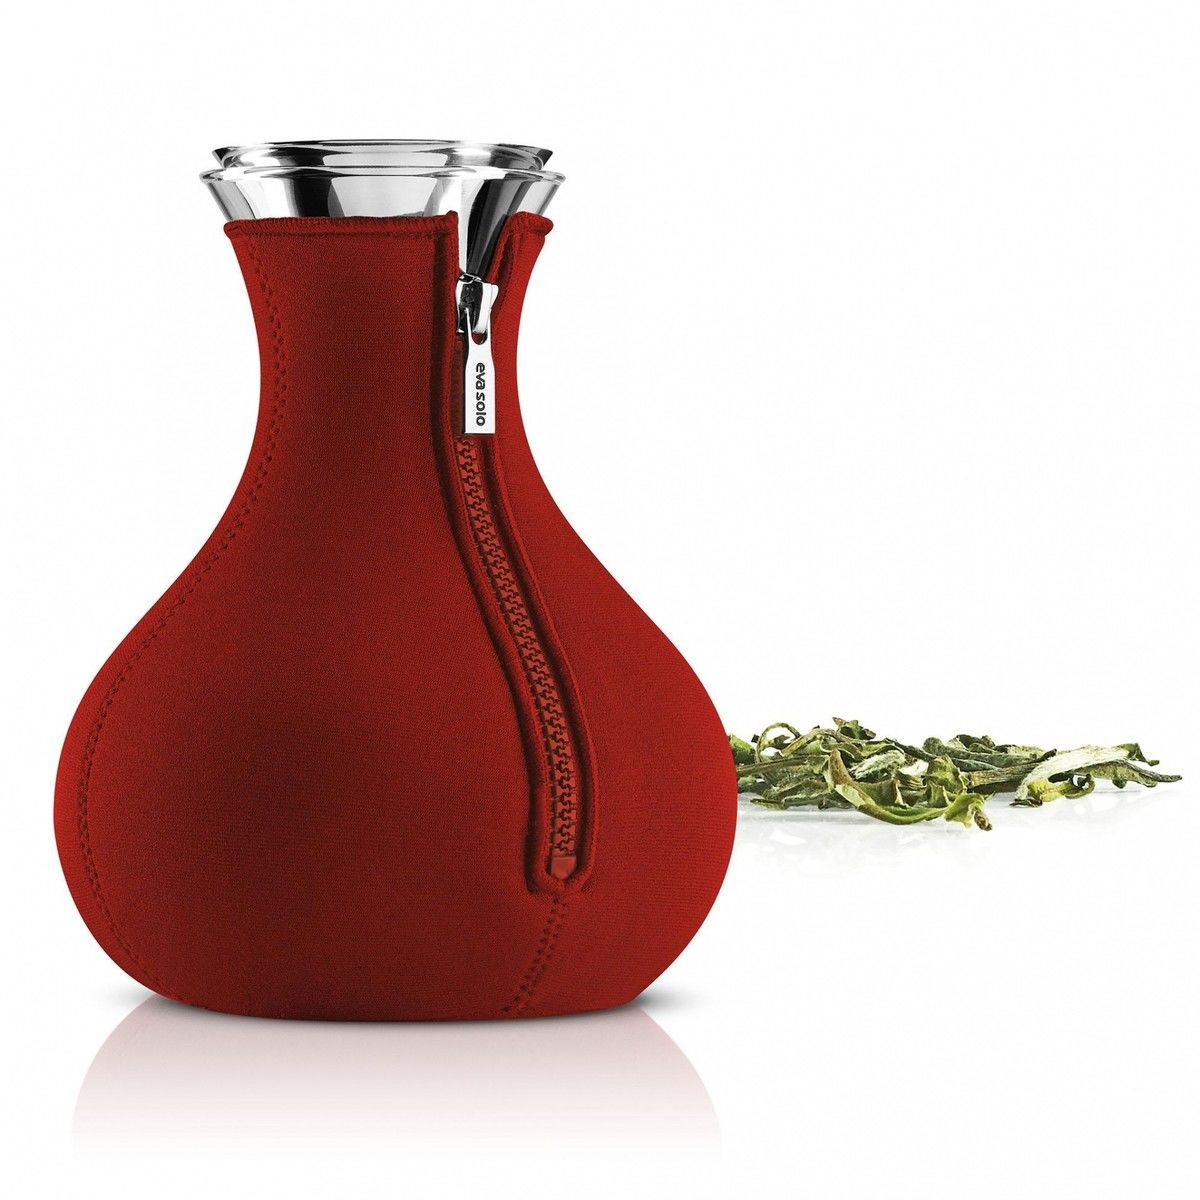 eva solo tea maker eva solo claus jensen. Black Bedroom Furniture Sets. Home Design Ideas